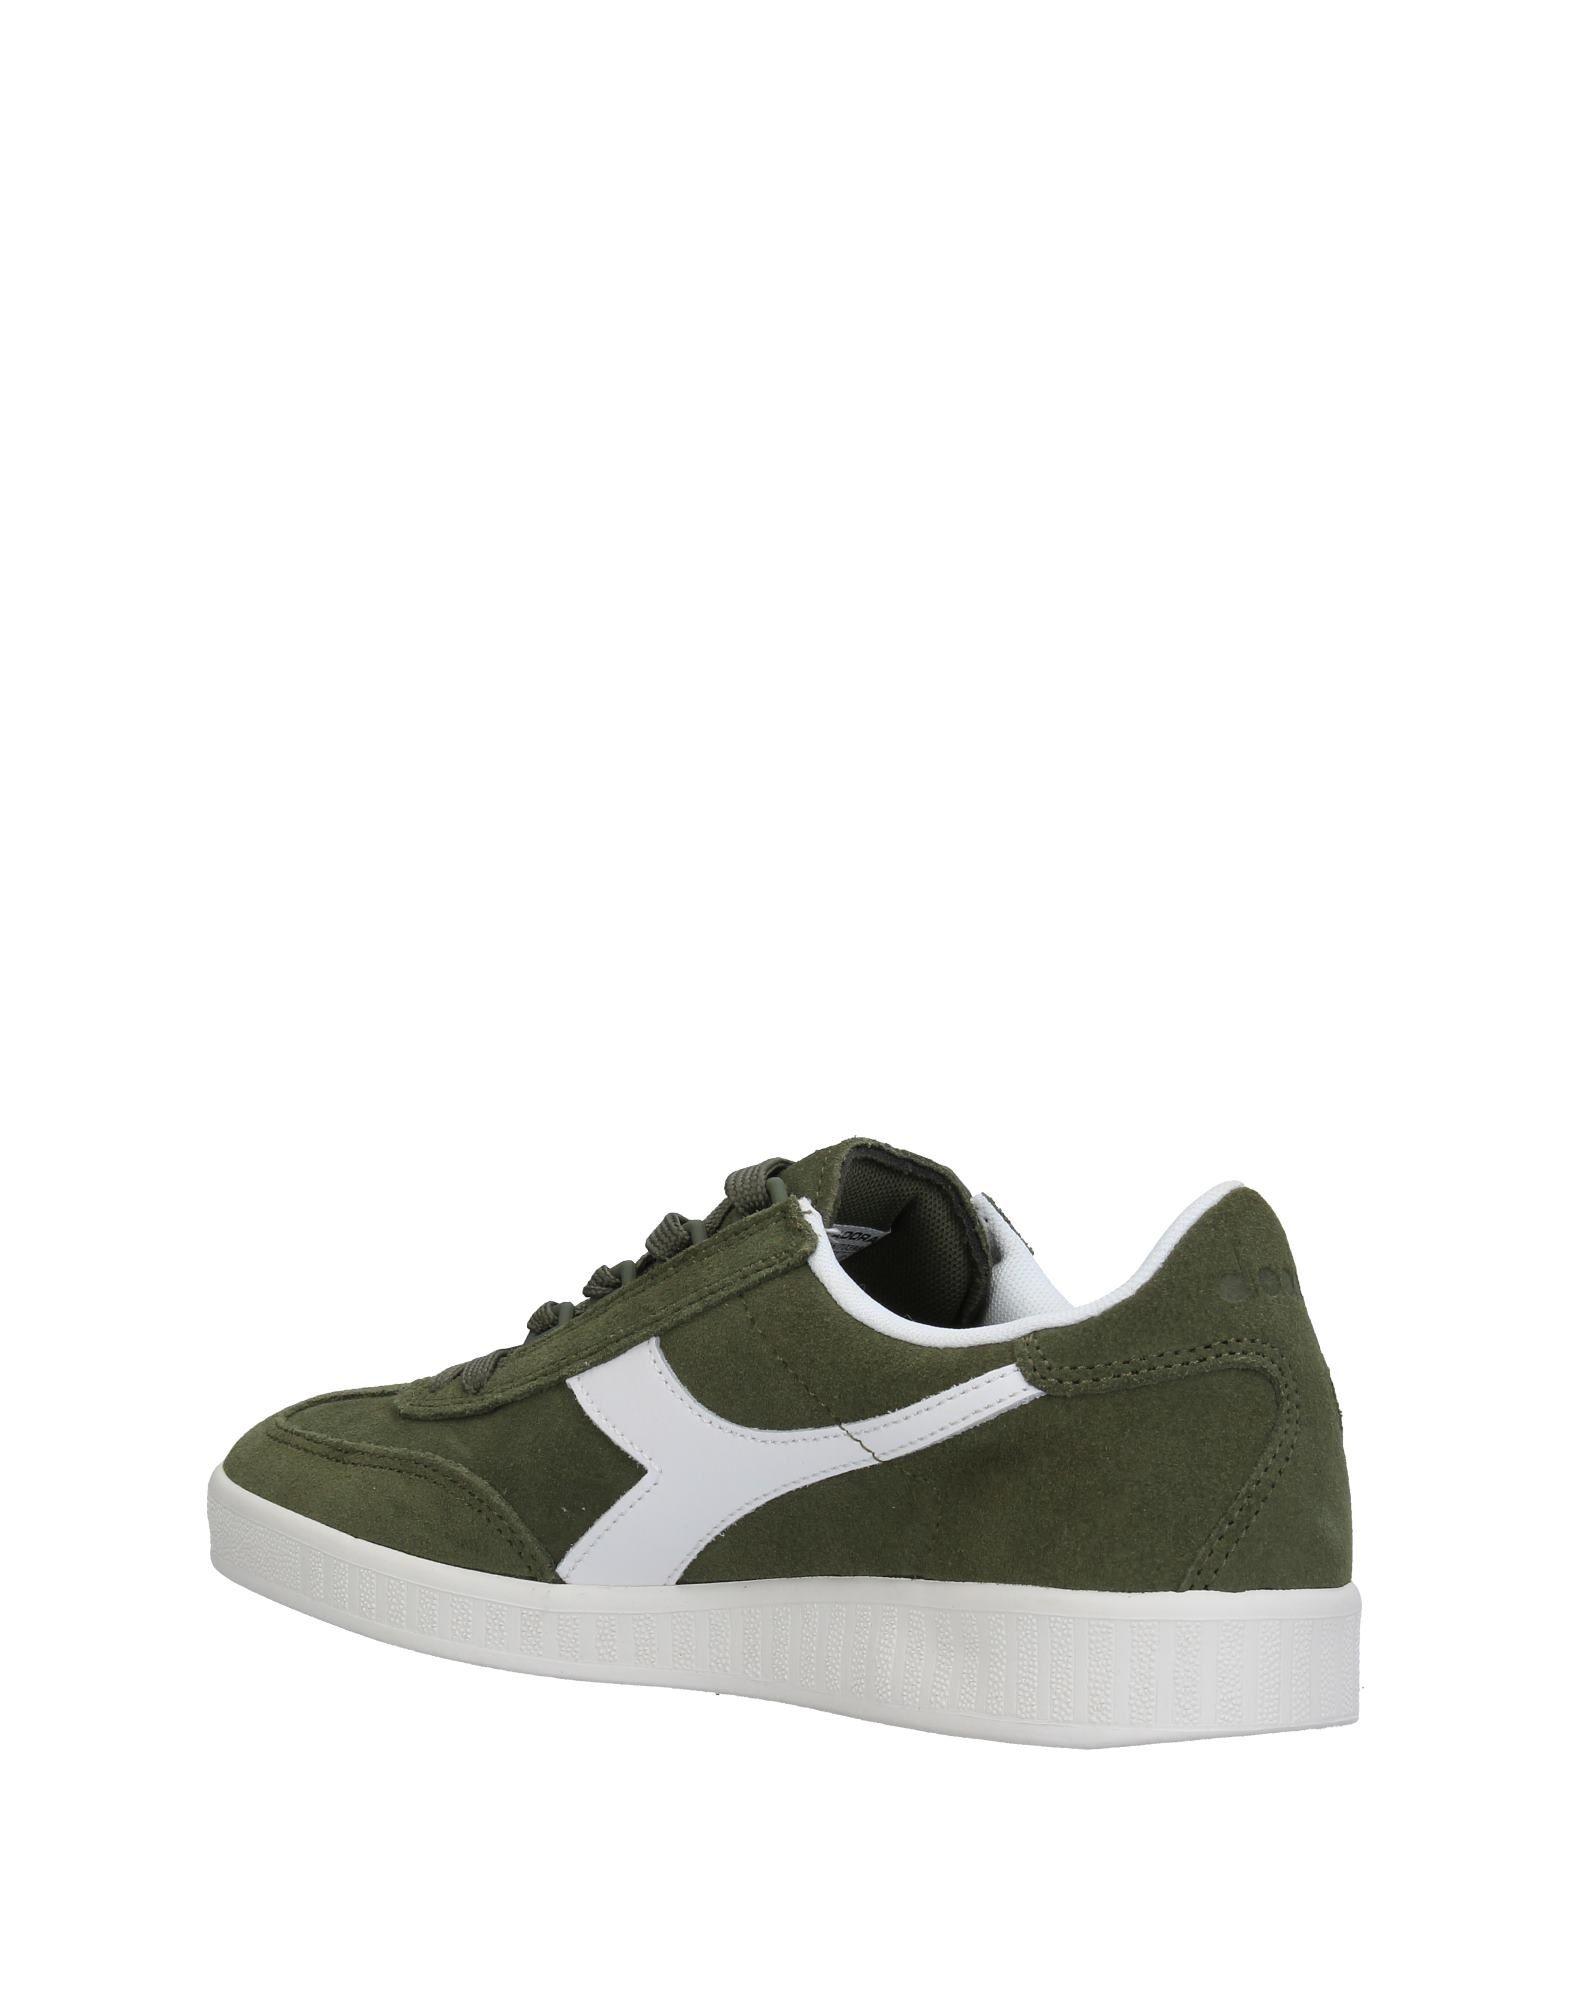 Rabatt echte Schuhe Diadora Sneakers Herren  11379452FX